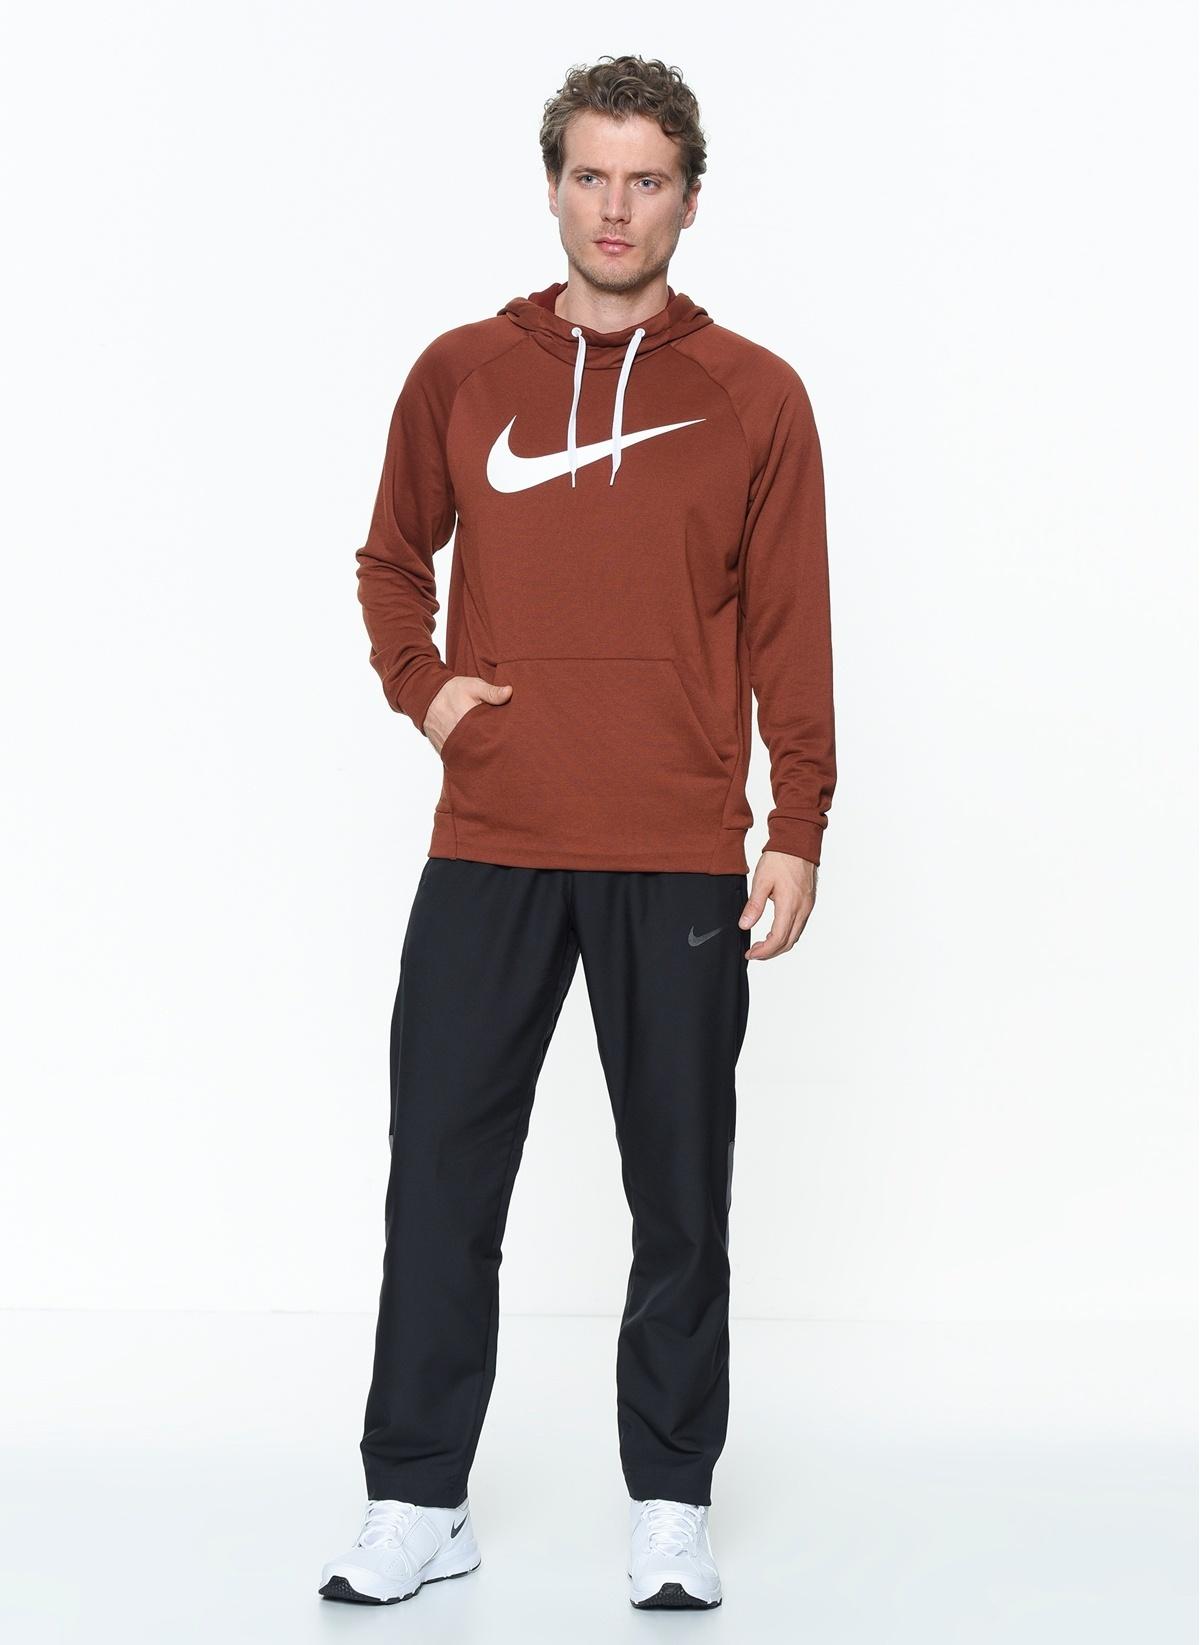 Nike Eşofman Altı 229.9 Tl